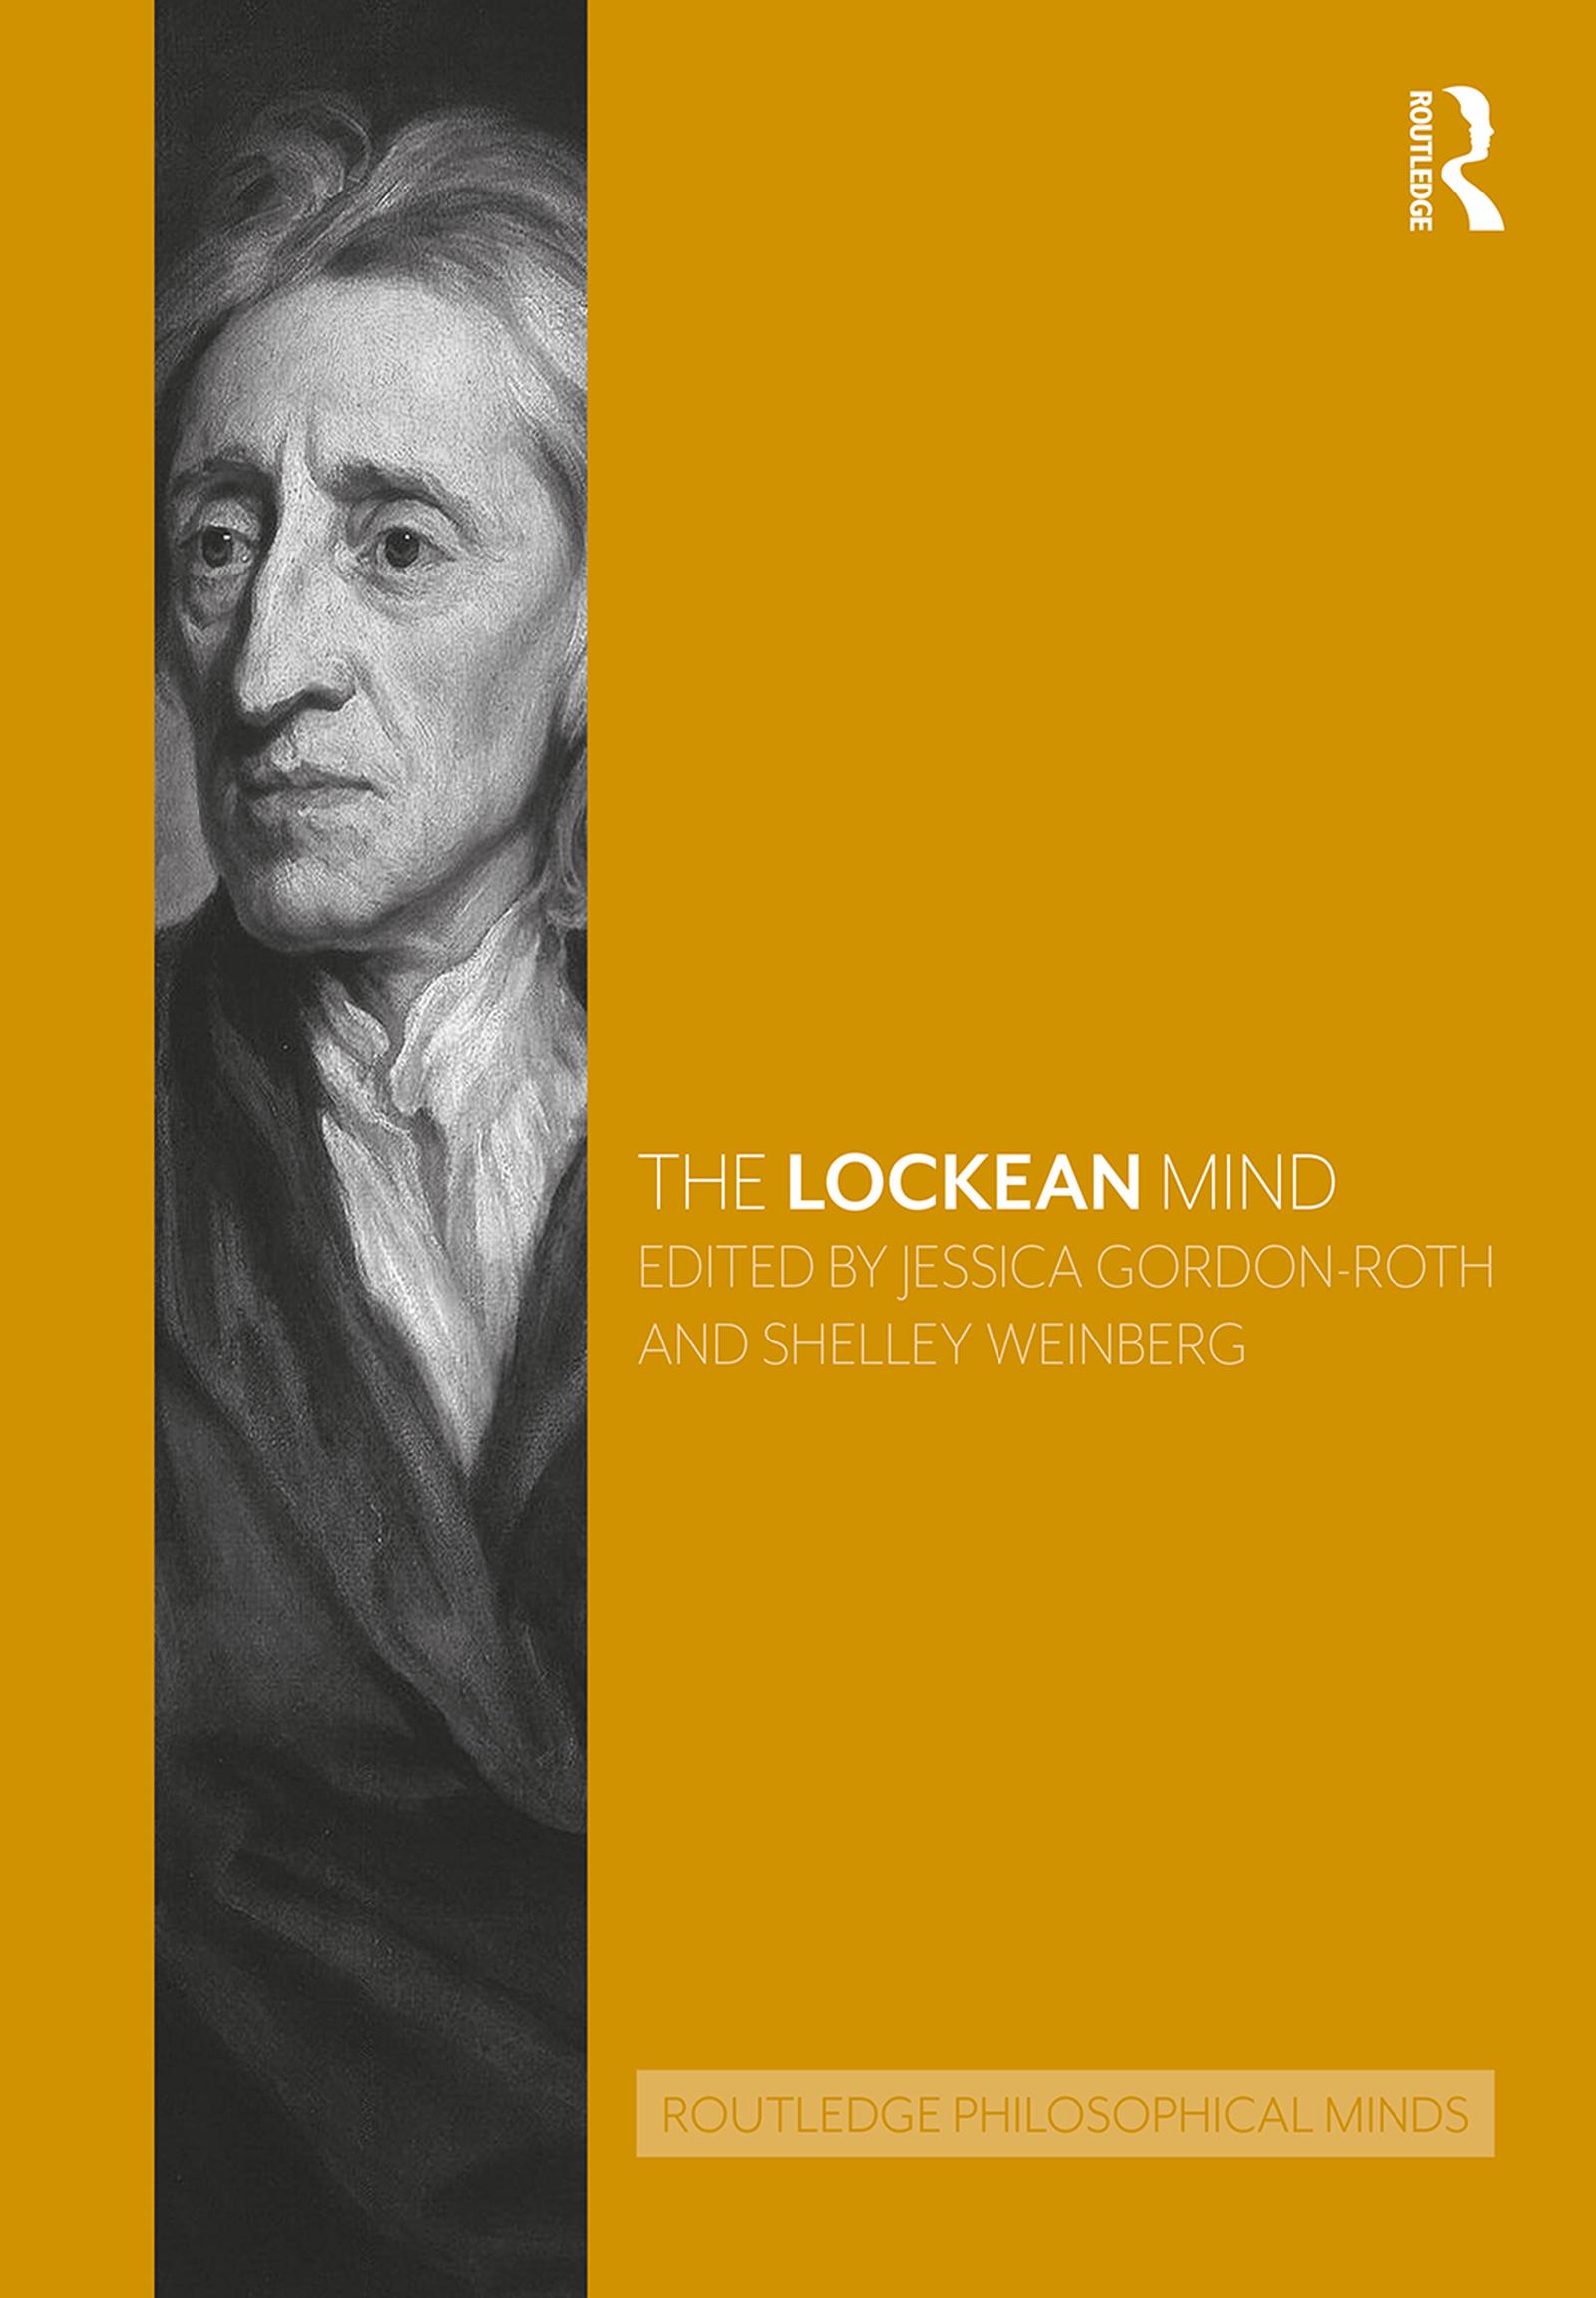 Locke on superaddition and thinking matter